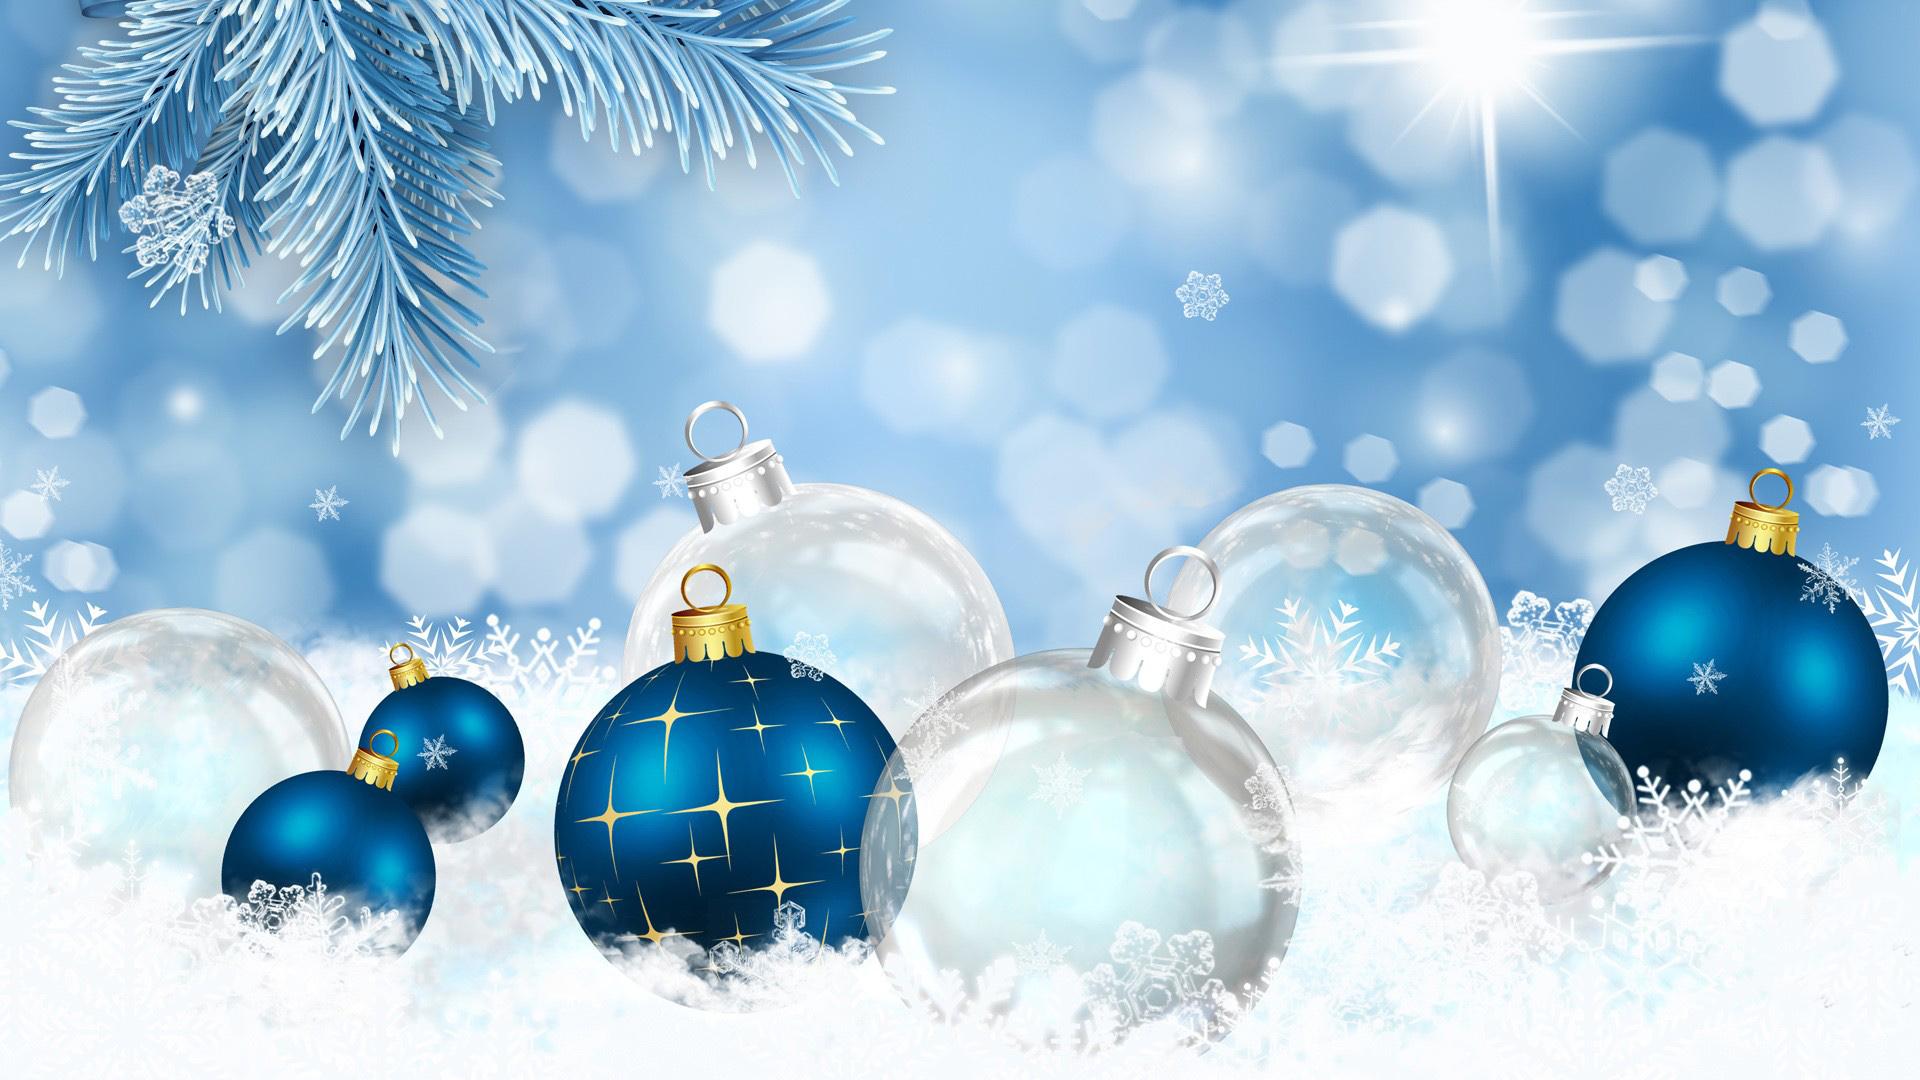 Blue Christmas Backgrounds - WallpaperSafari